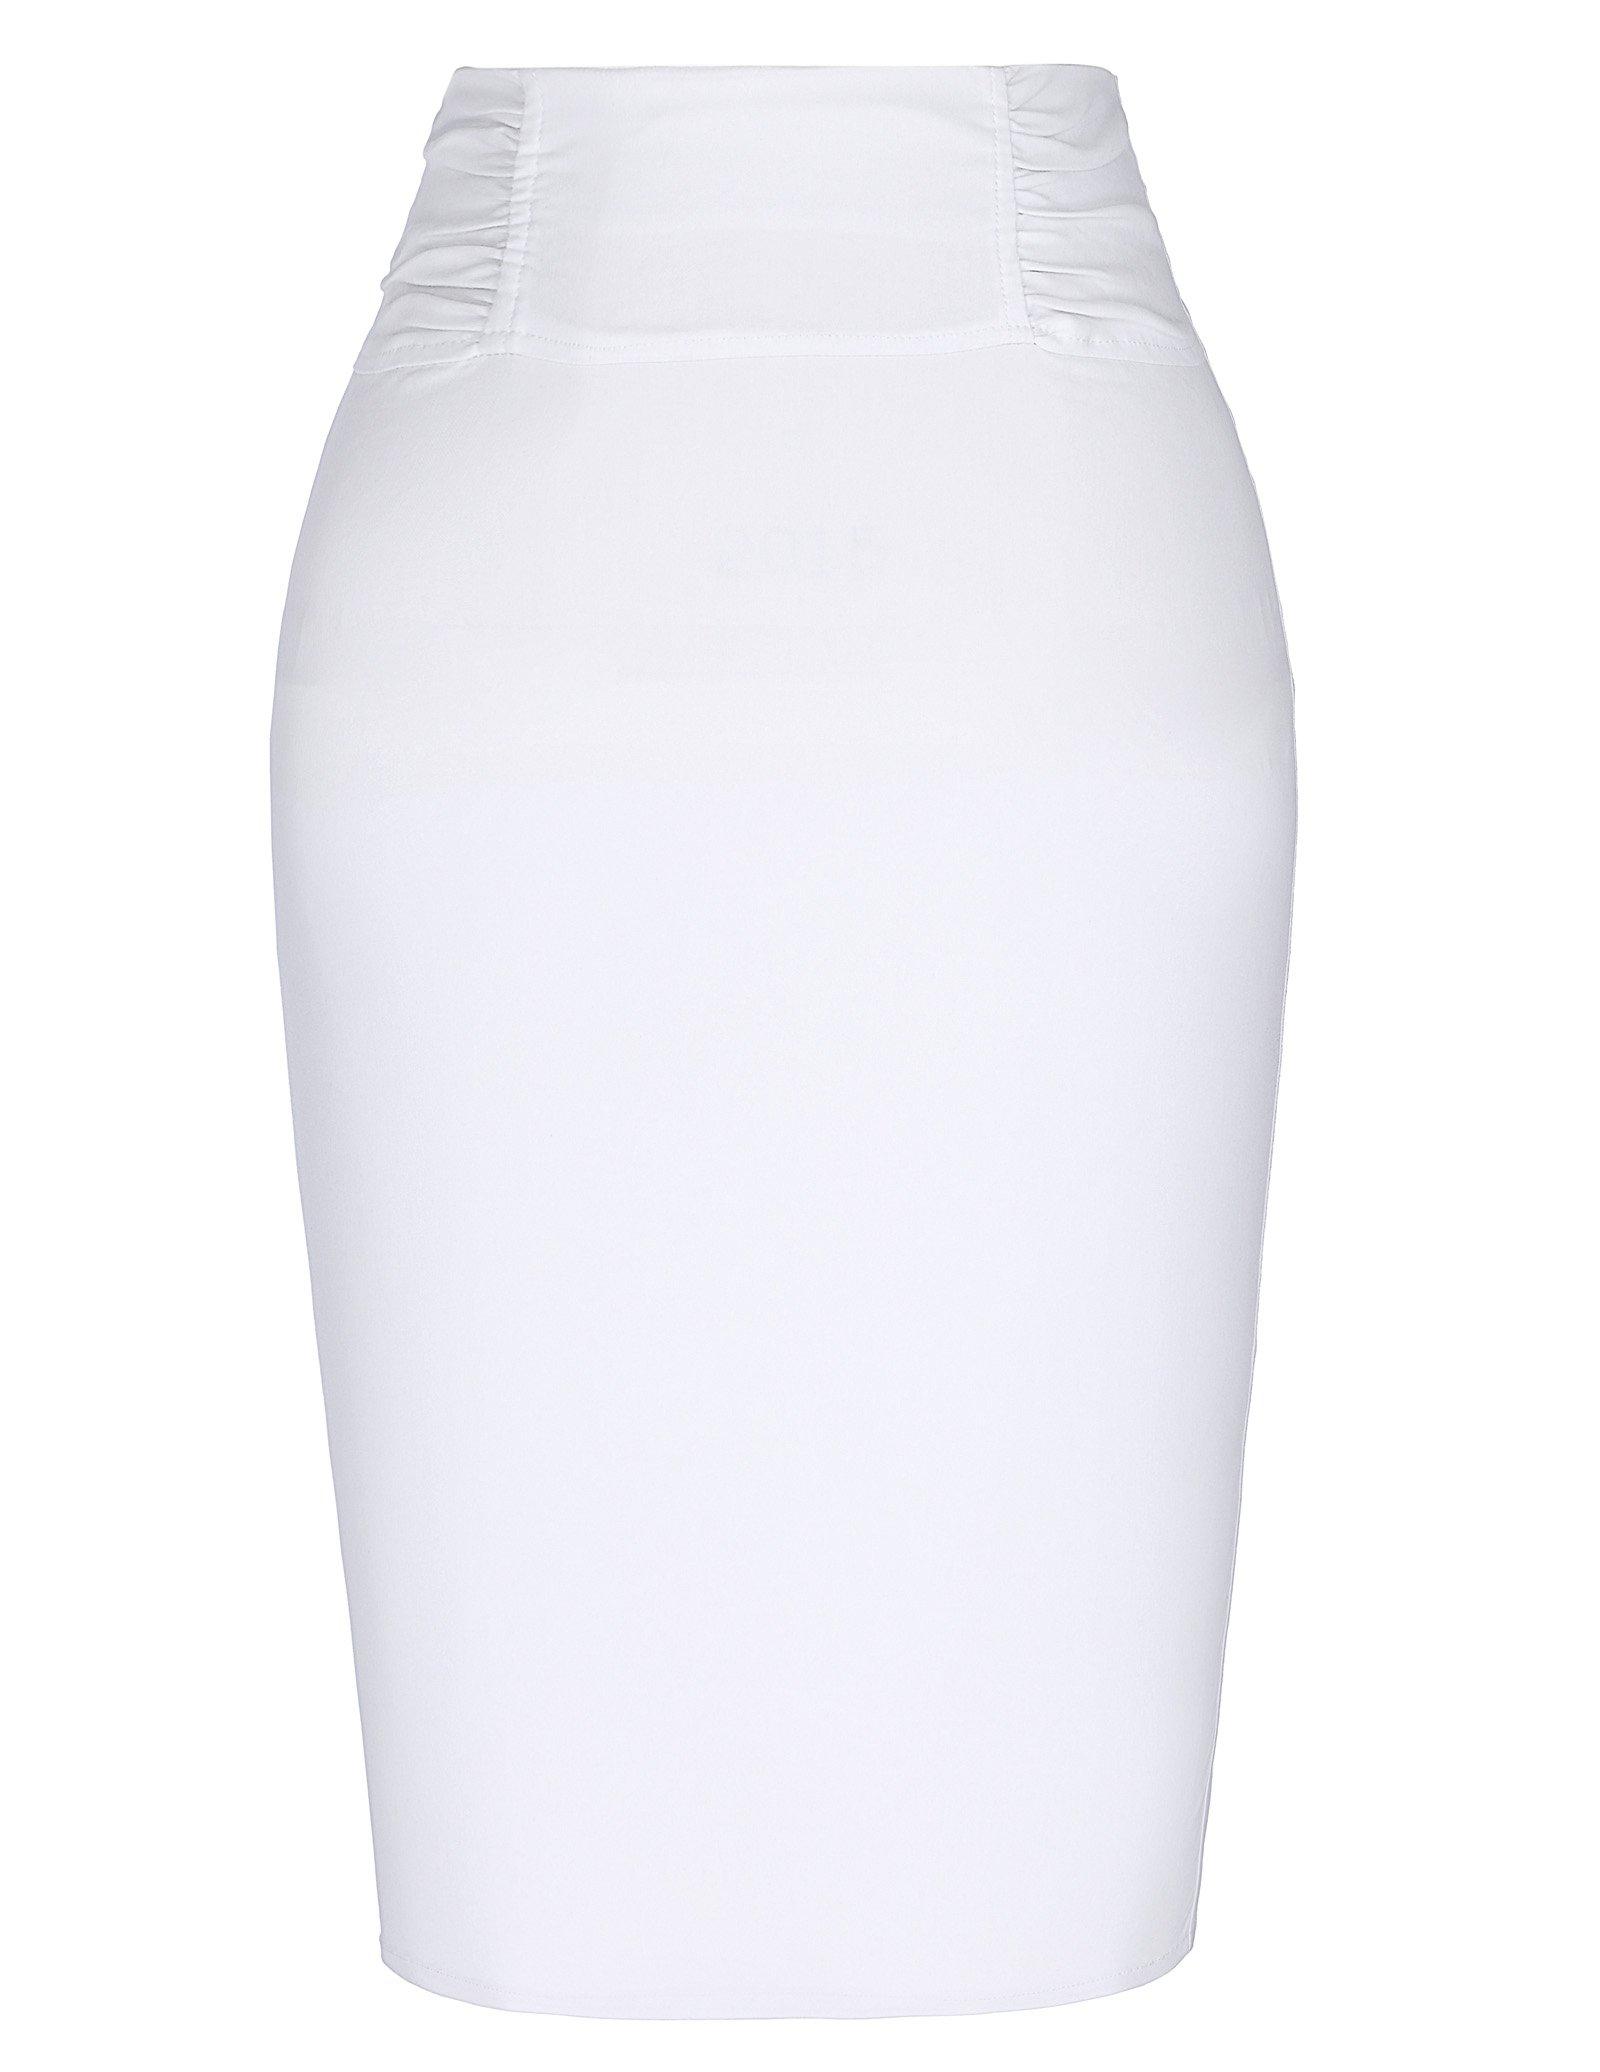 Kate Kasin Casual High Elastic Elegant Women Pencil Skirt White XL KK268-2